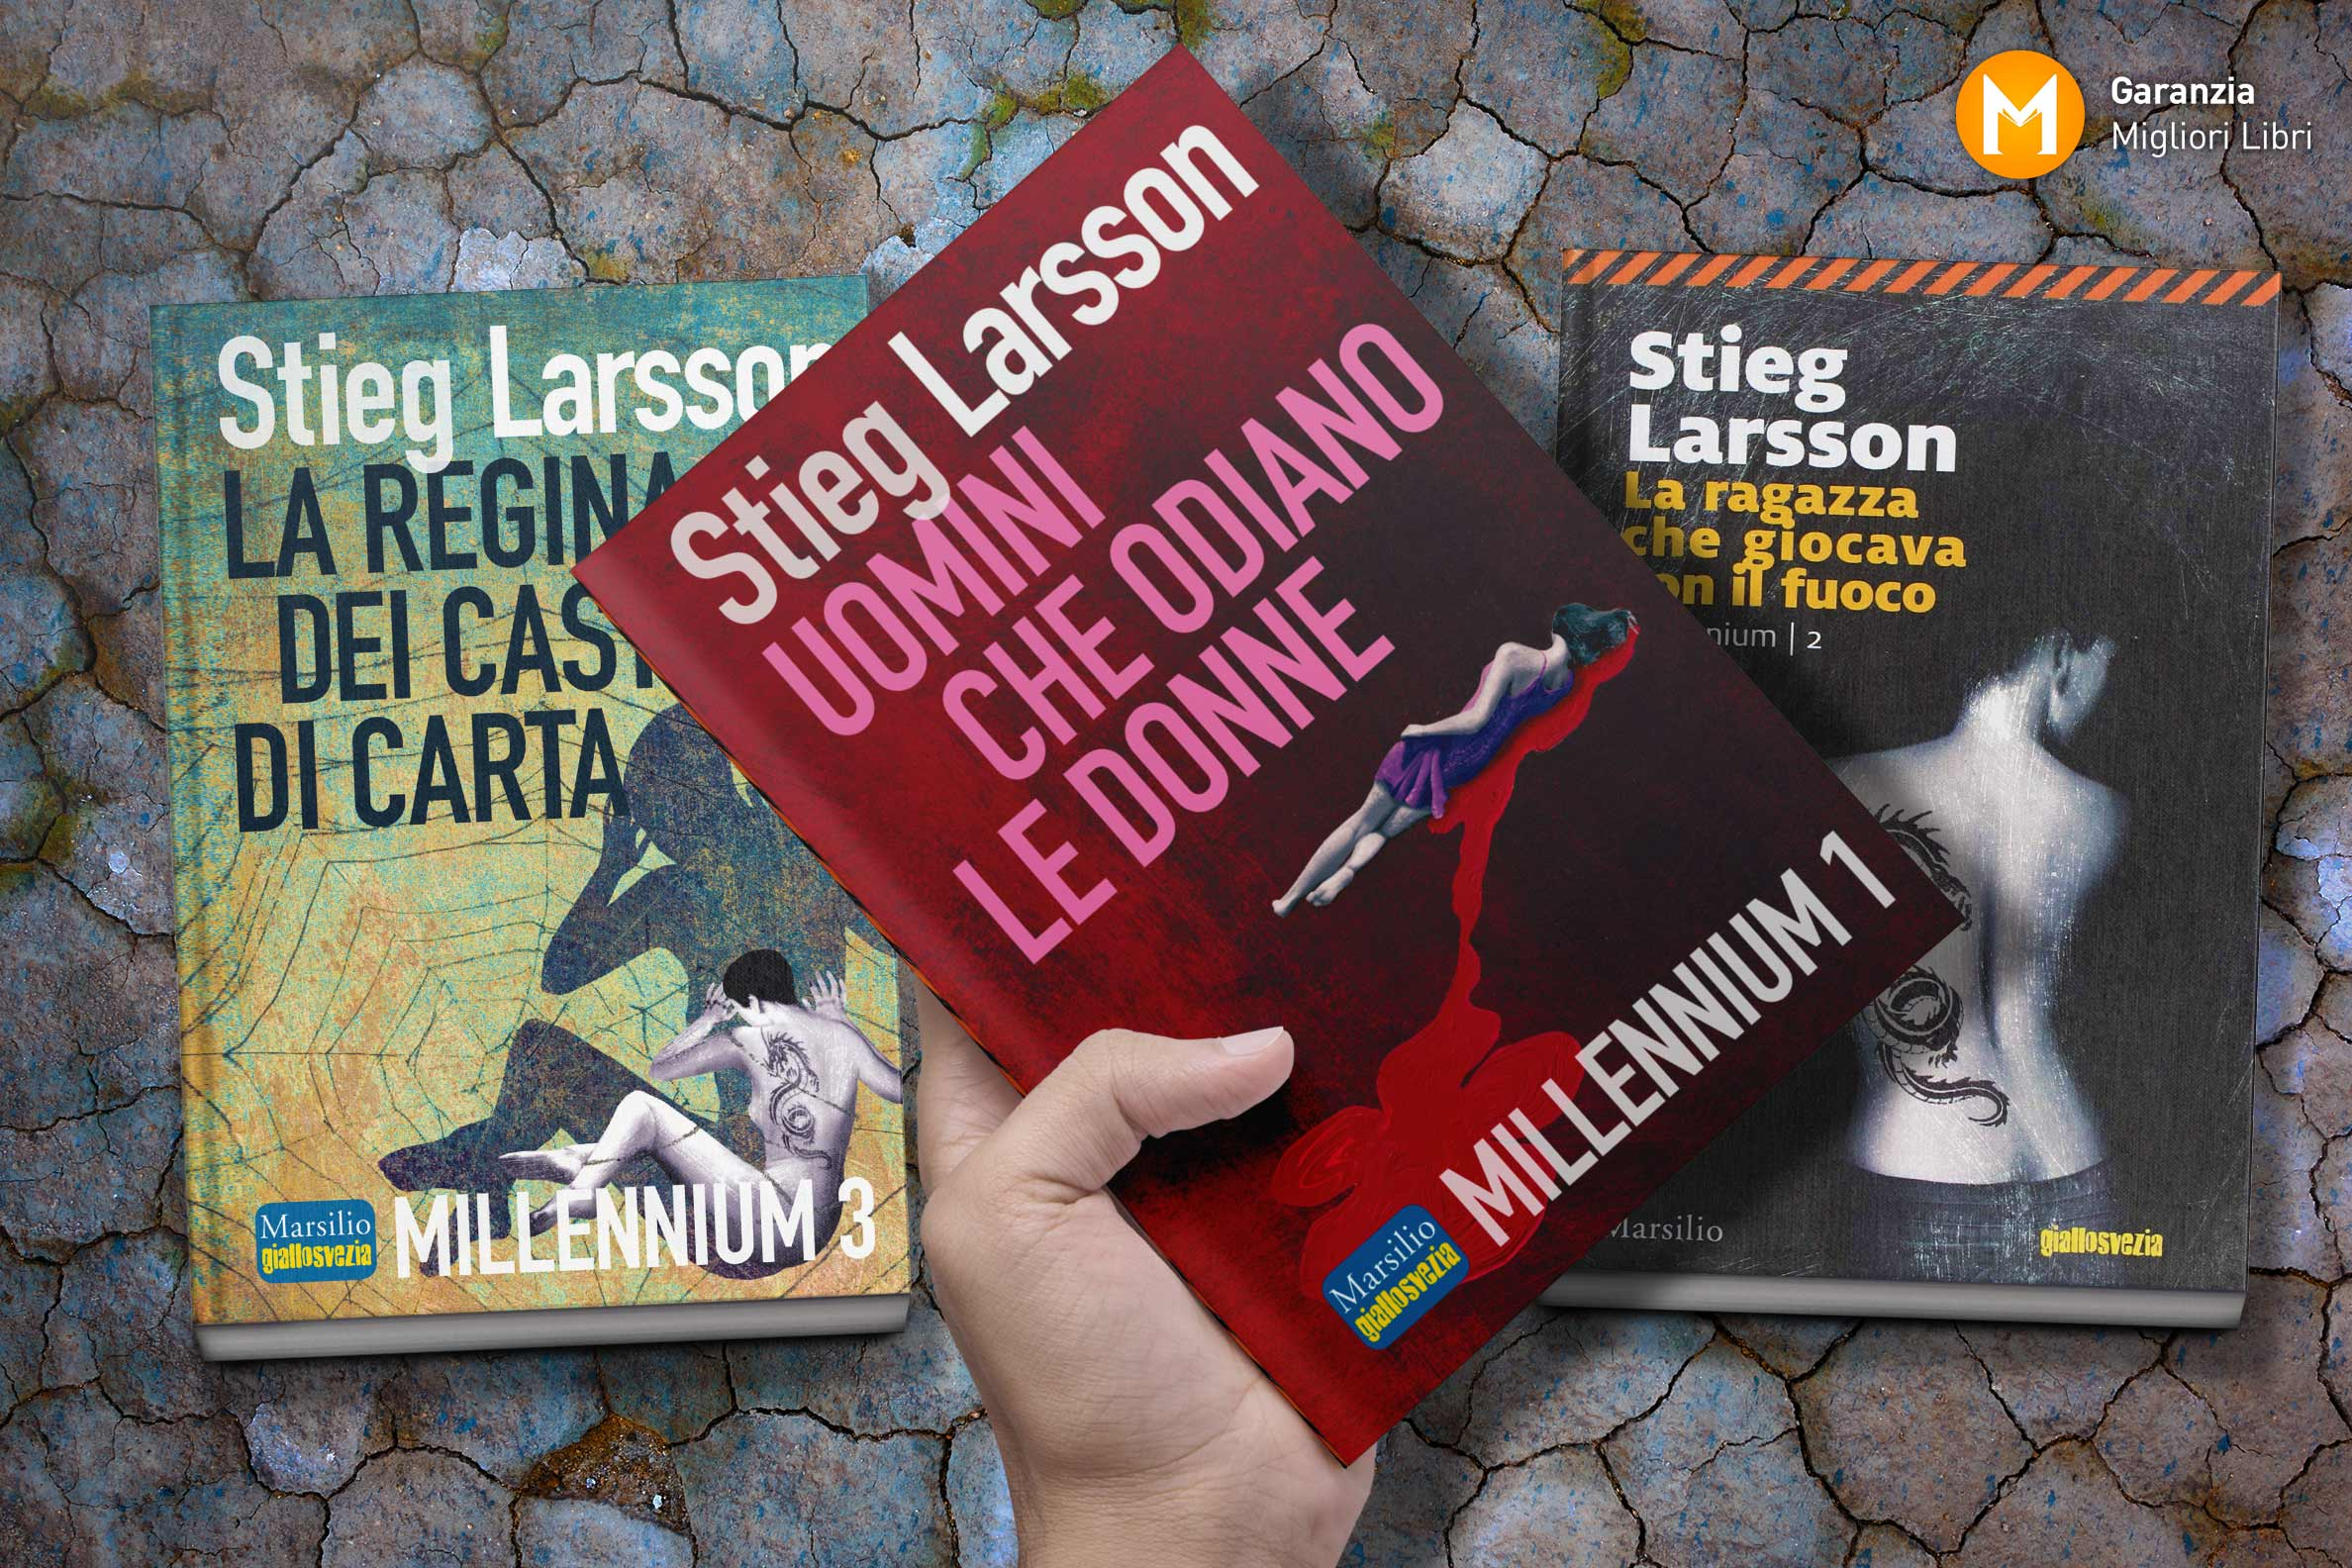 libri-stieg-larsson